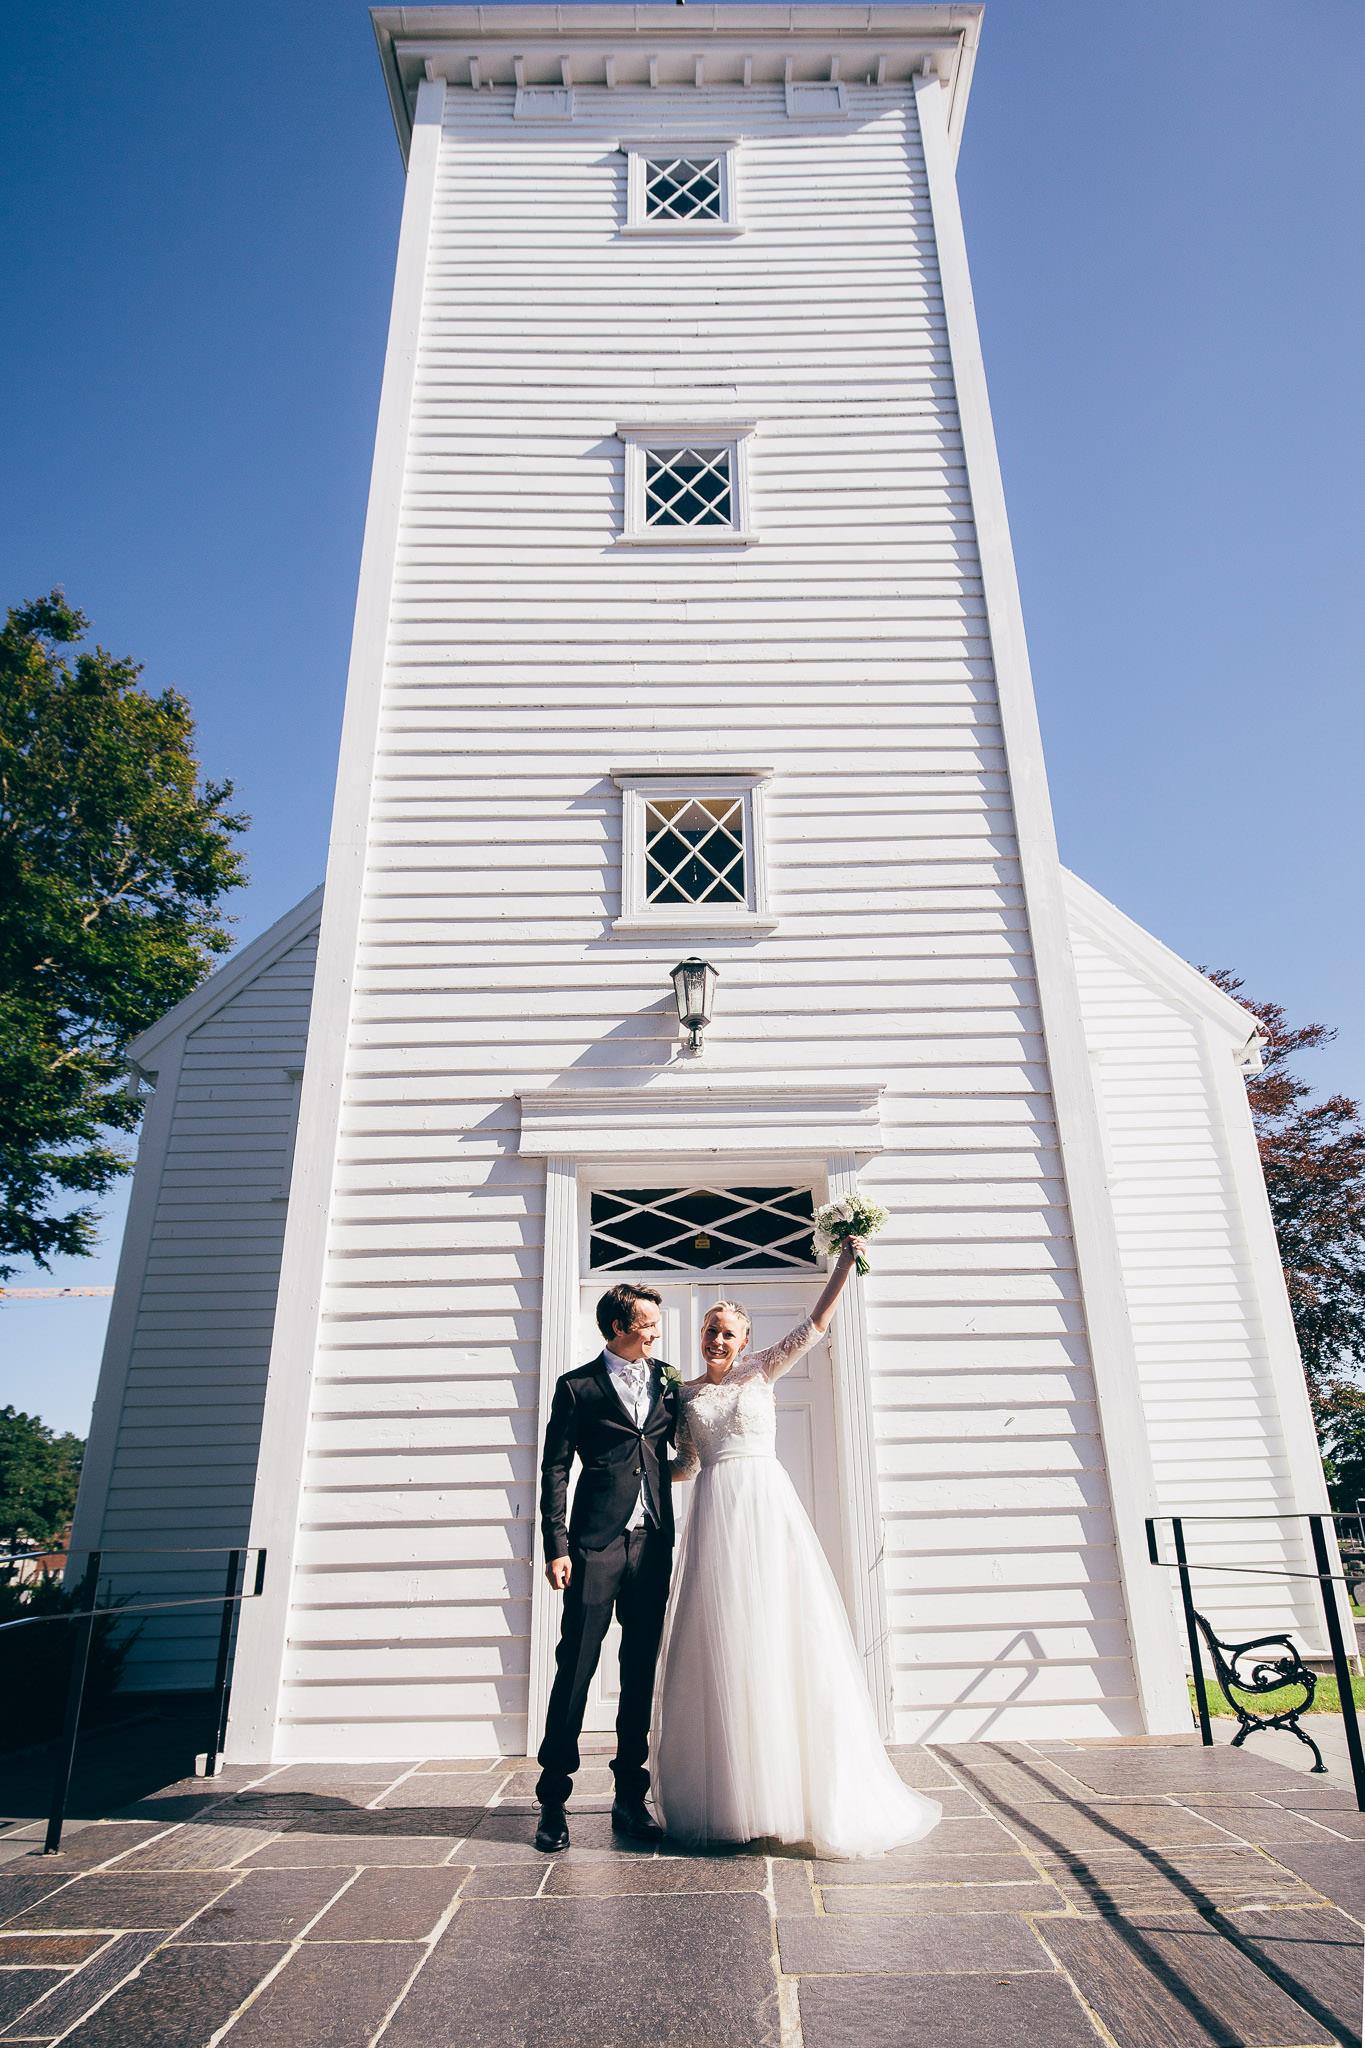 Wedding+Photographer+Norway+Bryllupsfotograf+Casey+Arneson+JT-70.jpg